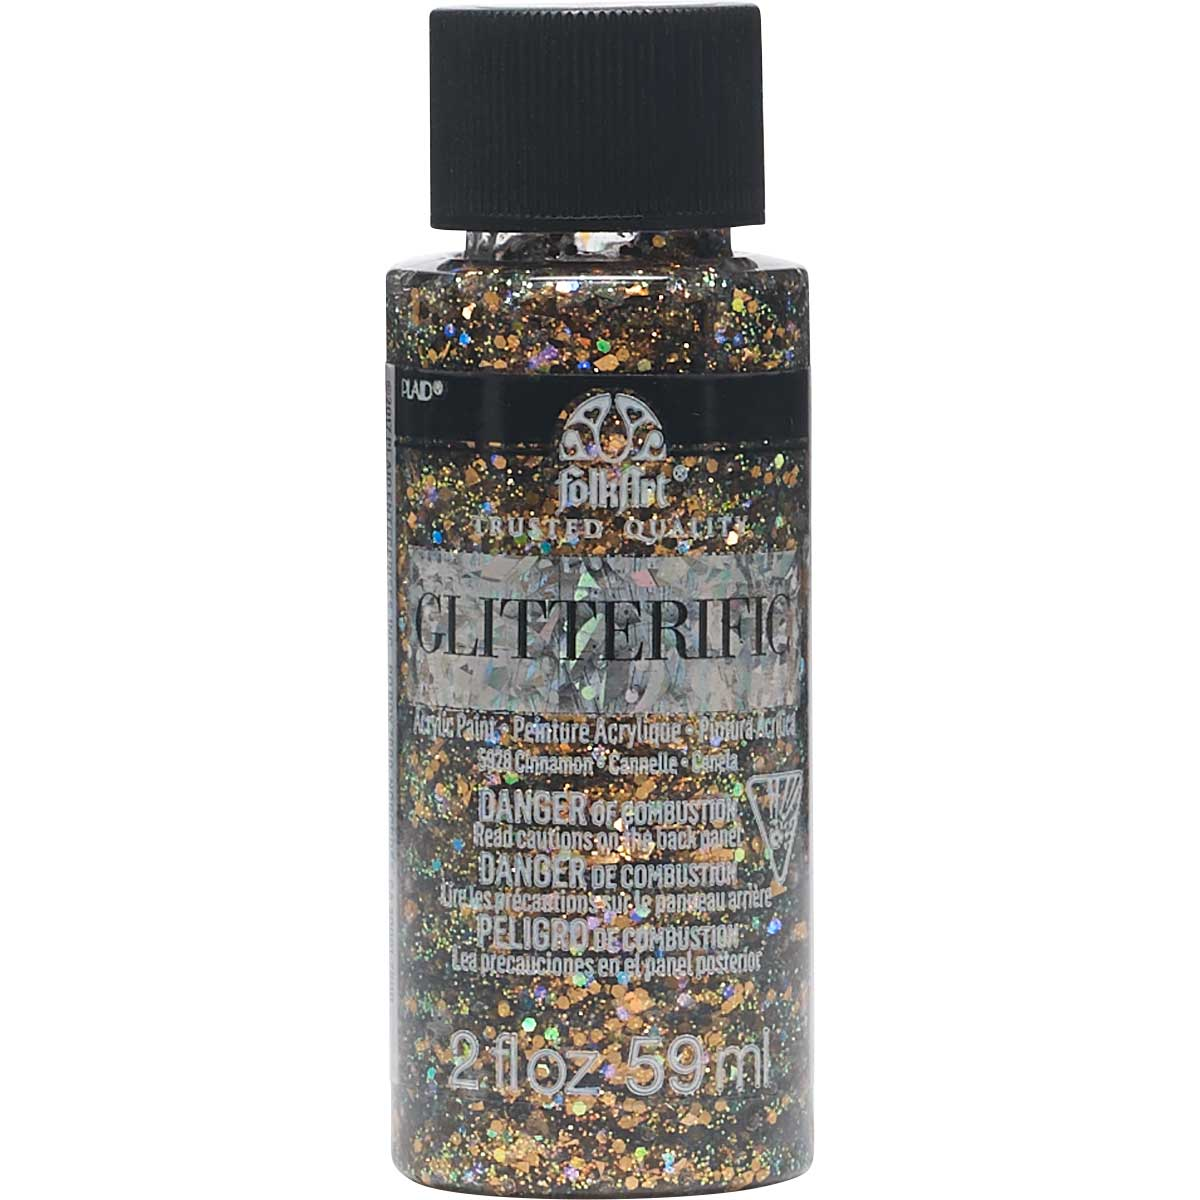 FolkArt ® Glitterific™ Acrylic Paint - Cinnamon, 2 oz. - 5928